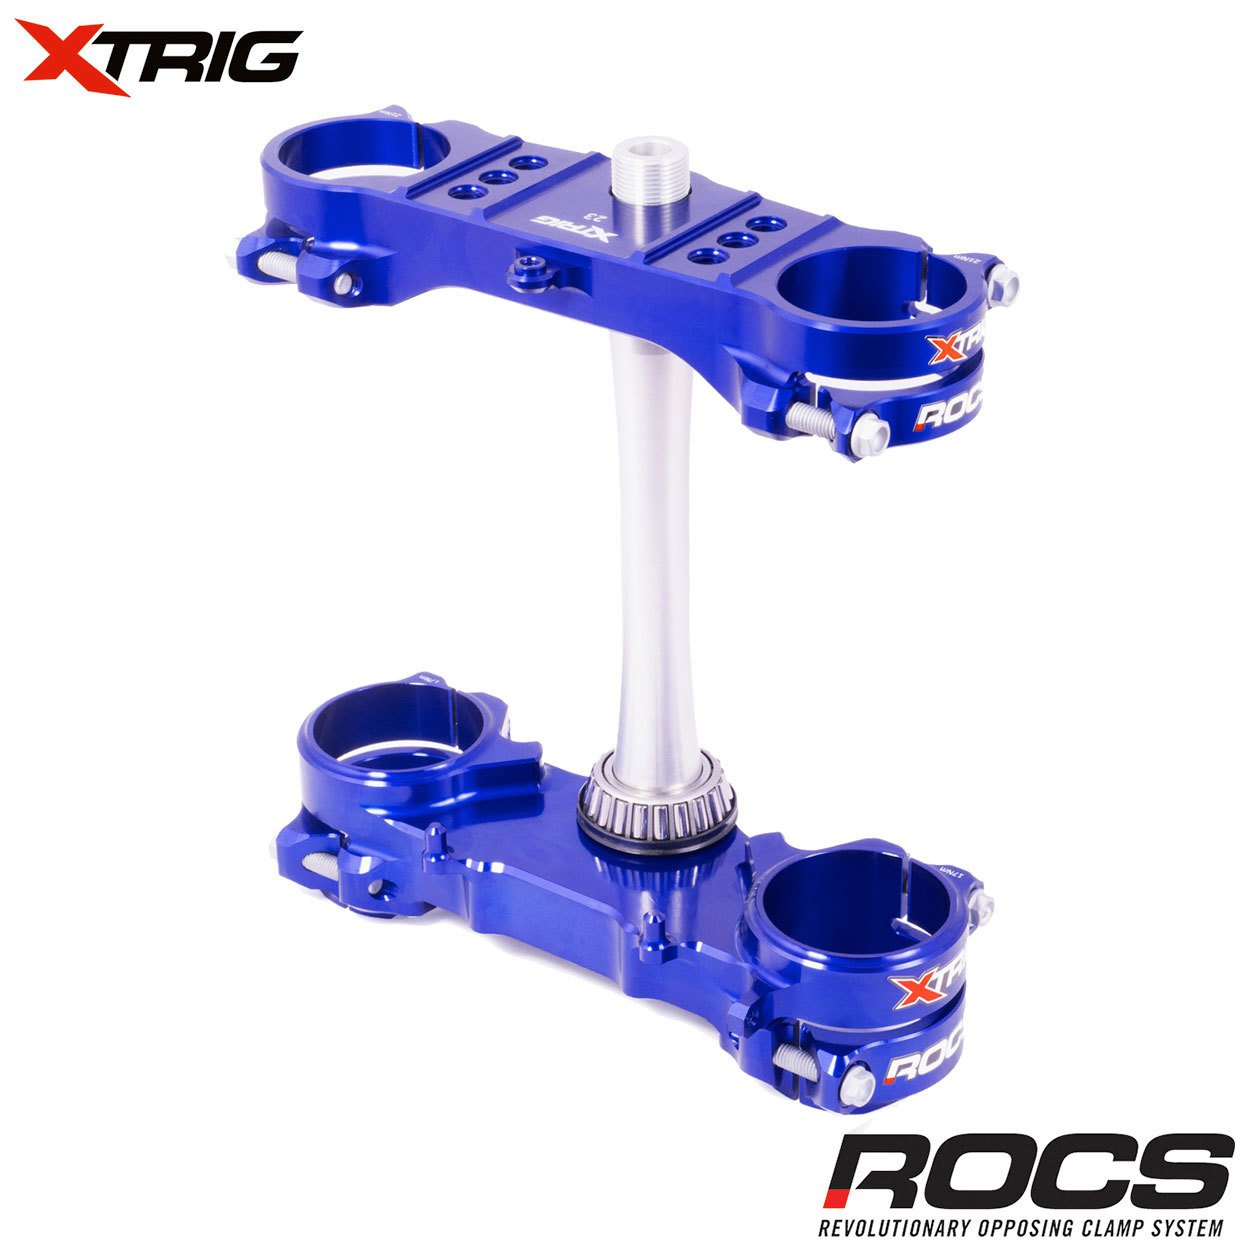 Brýle (Triple-Clamps) kompletní Xtrig ROCS tech Yamaha YZF250 / 12-18 + YZF450 / 10-15+18 (ofset 22)